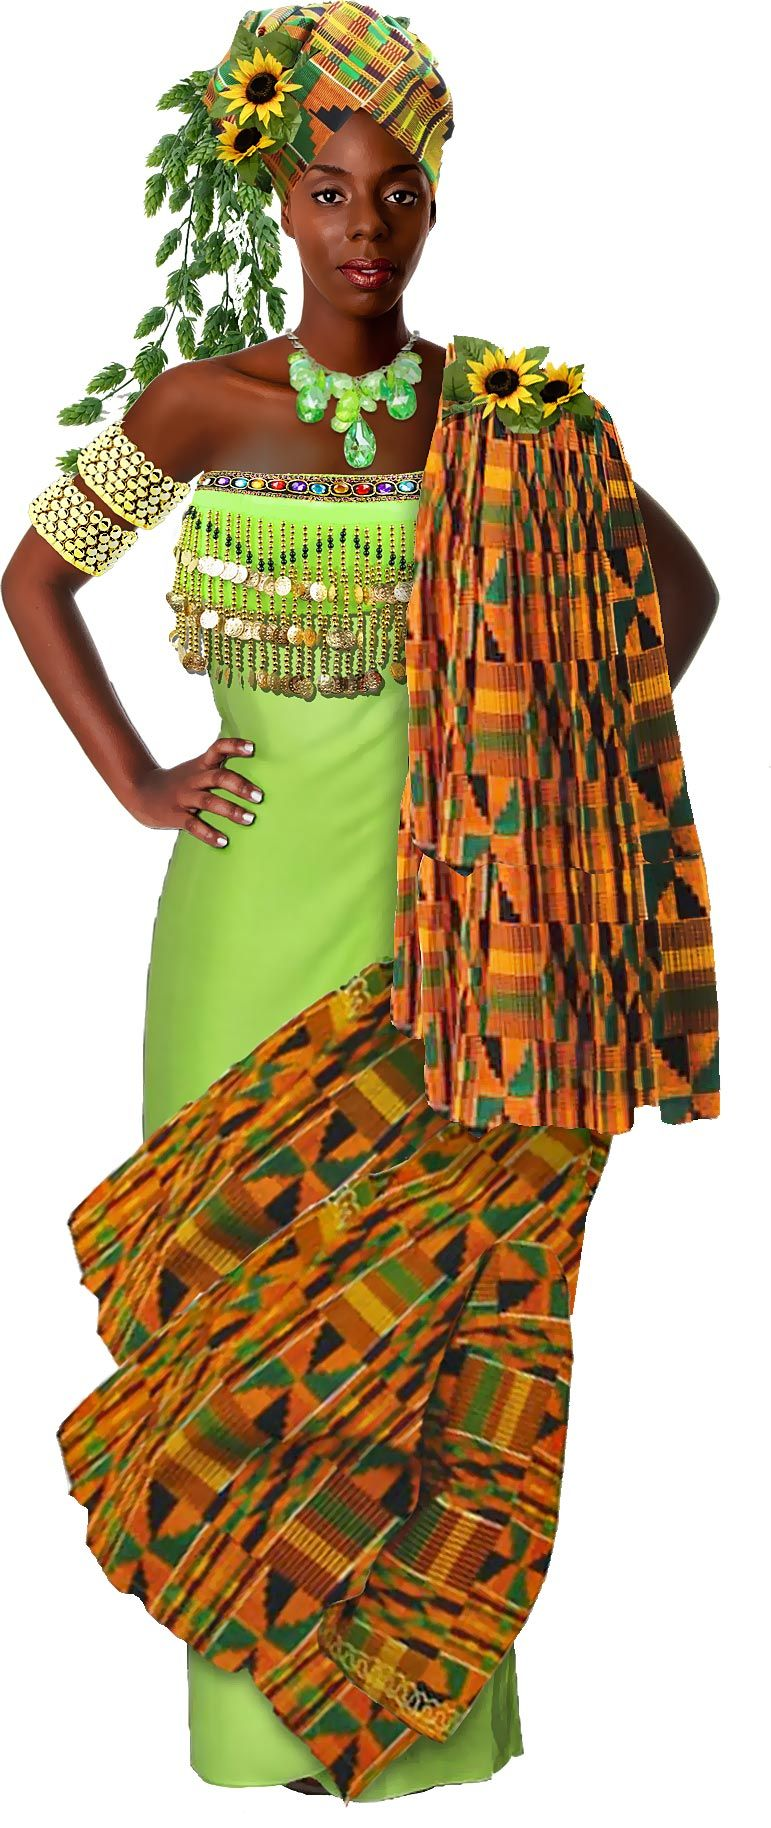 Asase Yaa is the earth goddess of the Asante people in Ghana